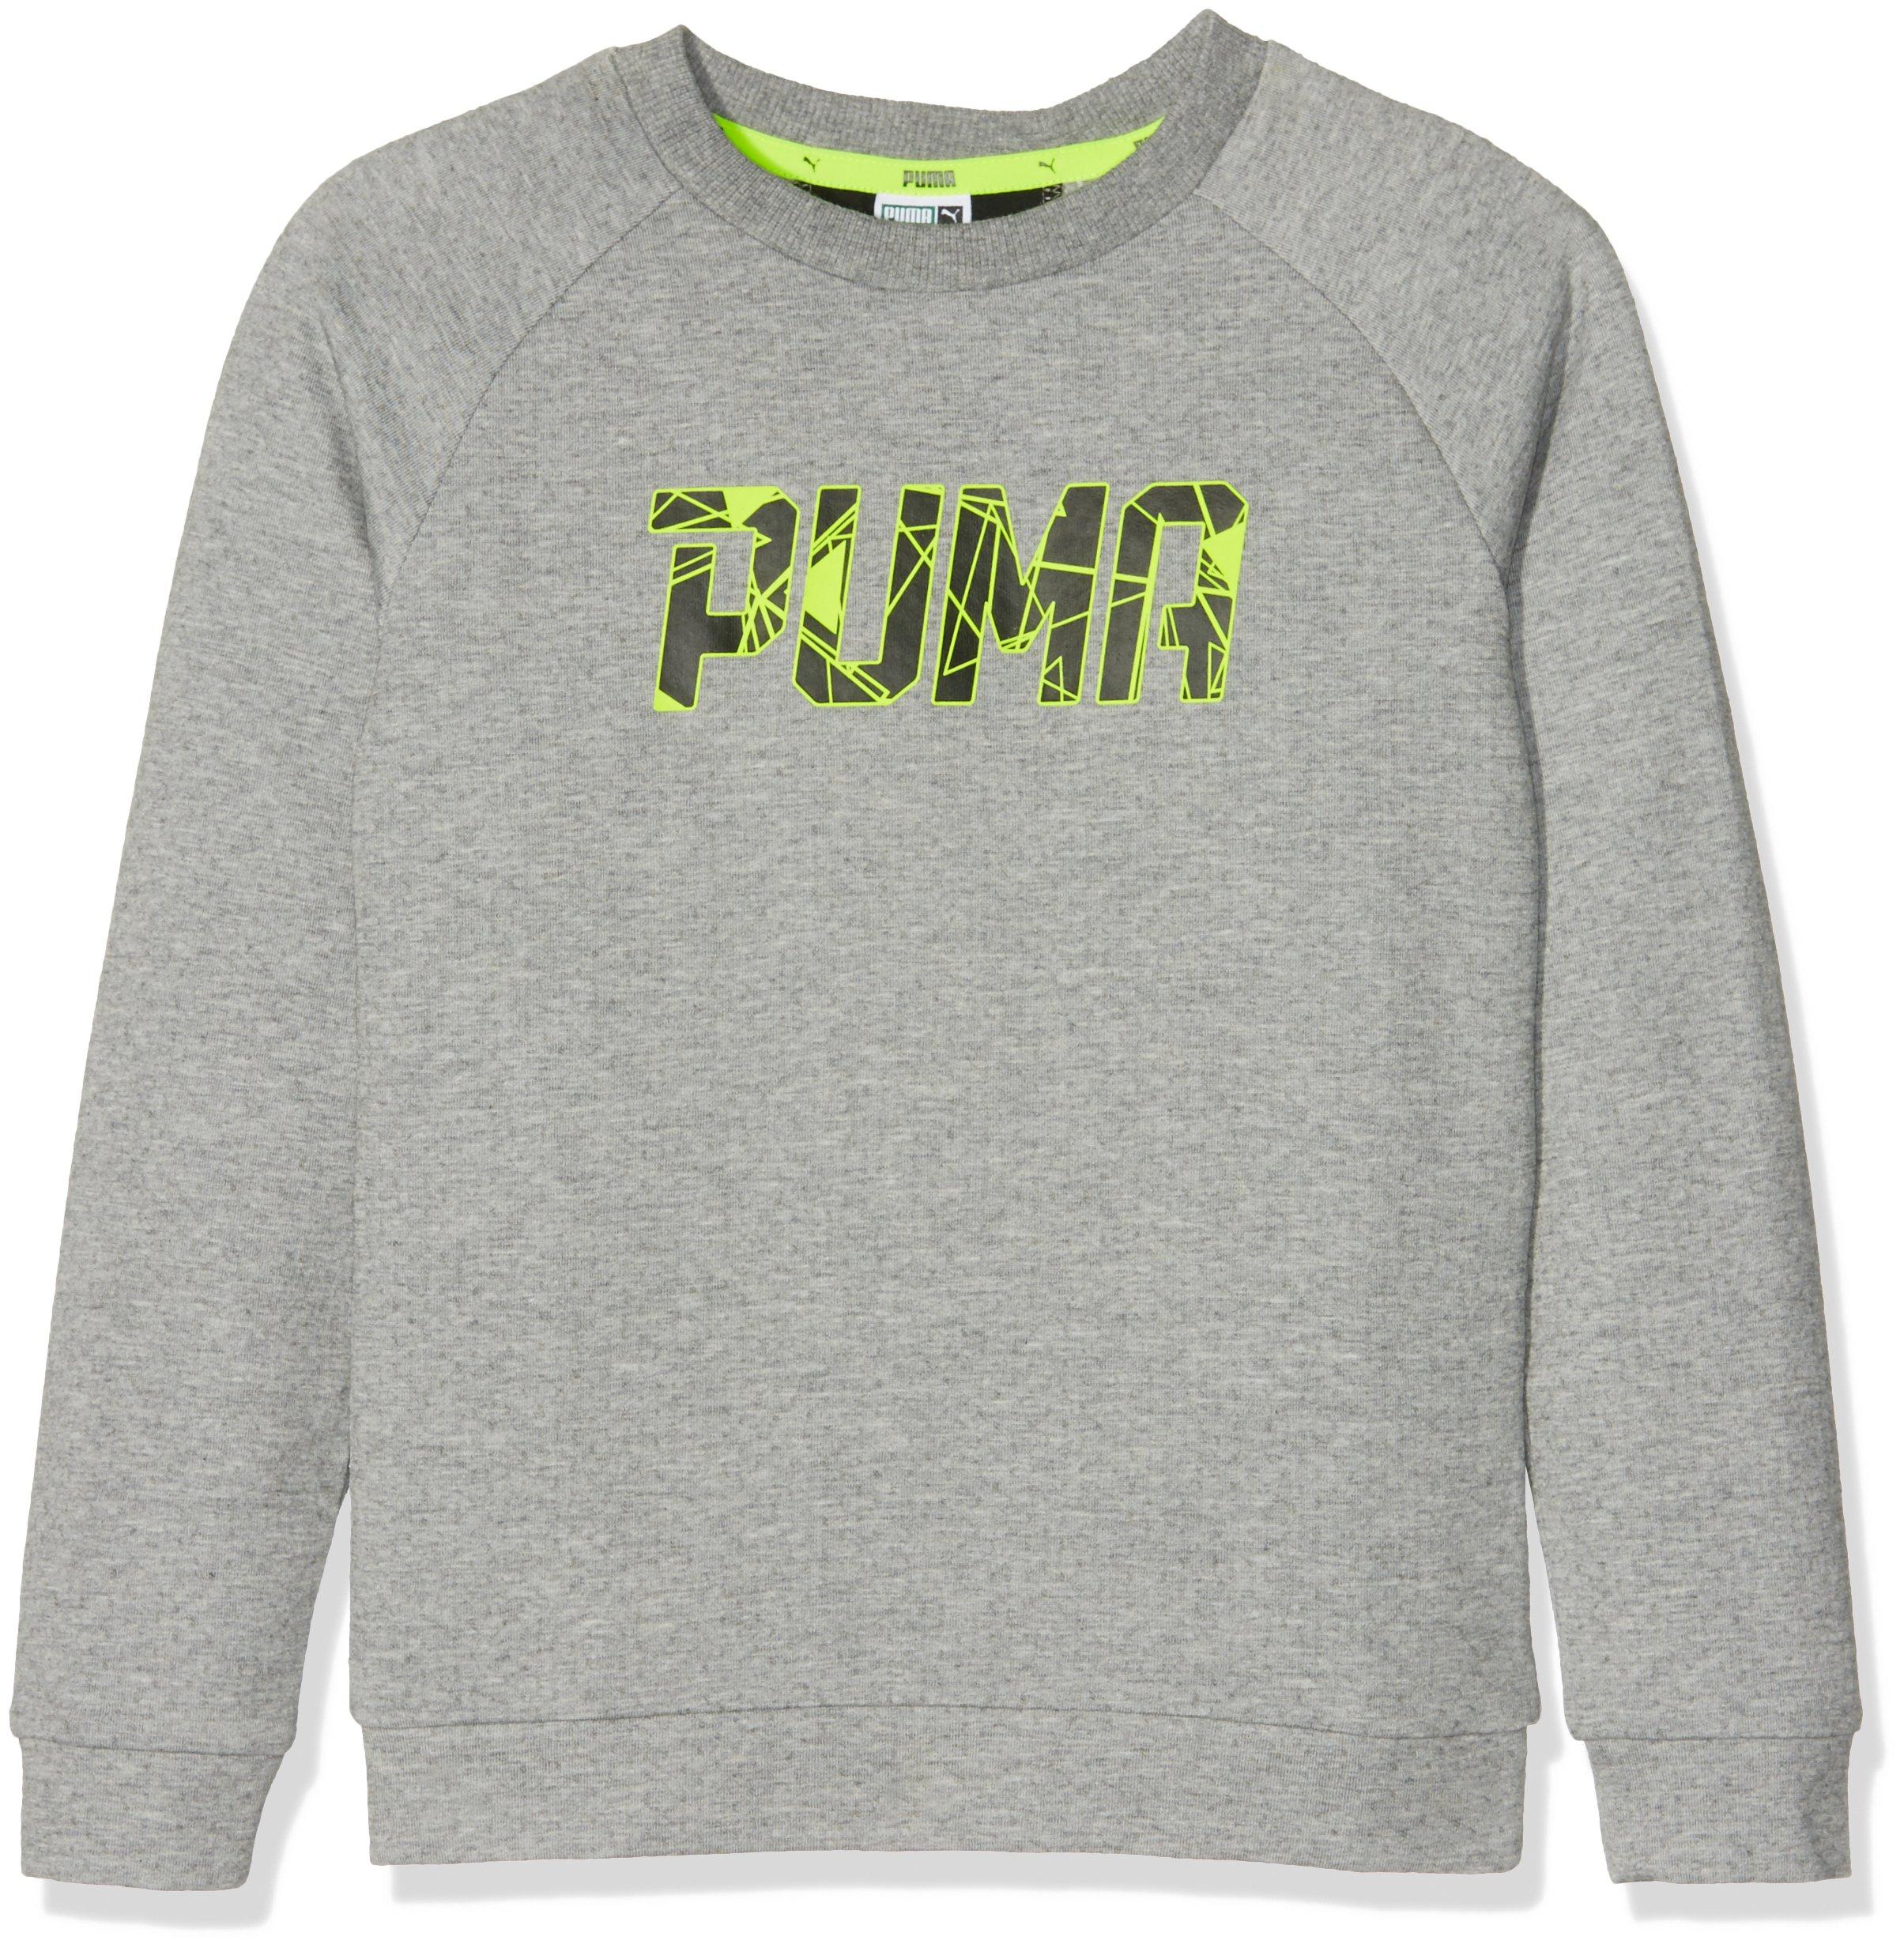 Puma Sports Style Crew Sweat, Felpa Unisex Bambini, Grigio (Medium Gray Heather), 128